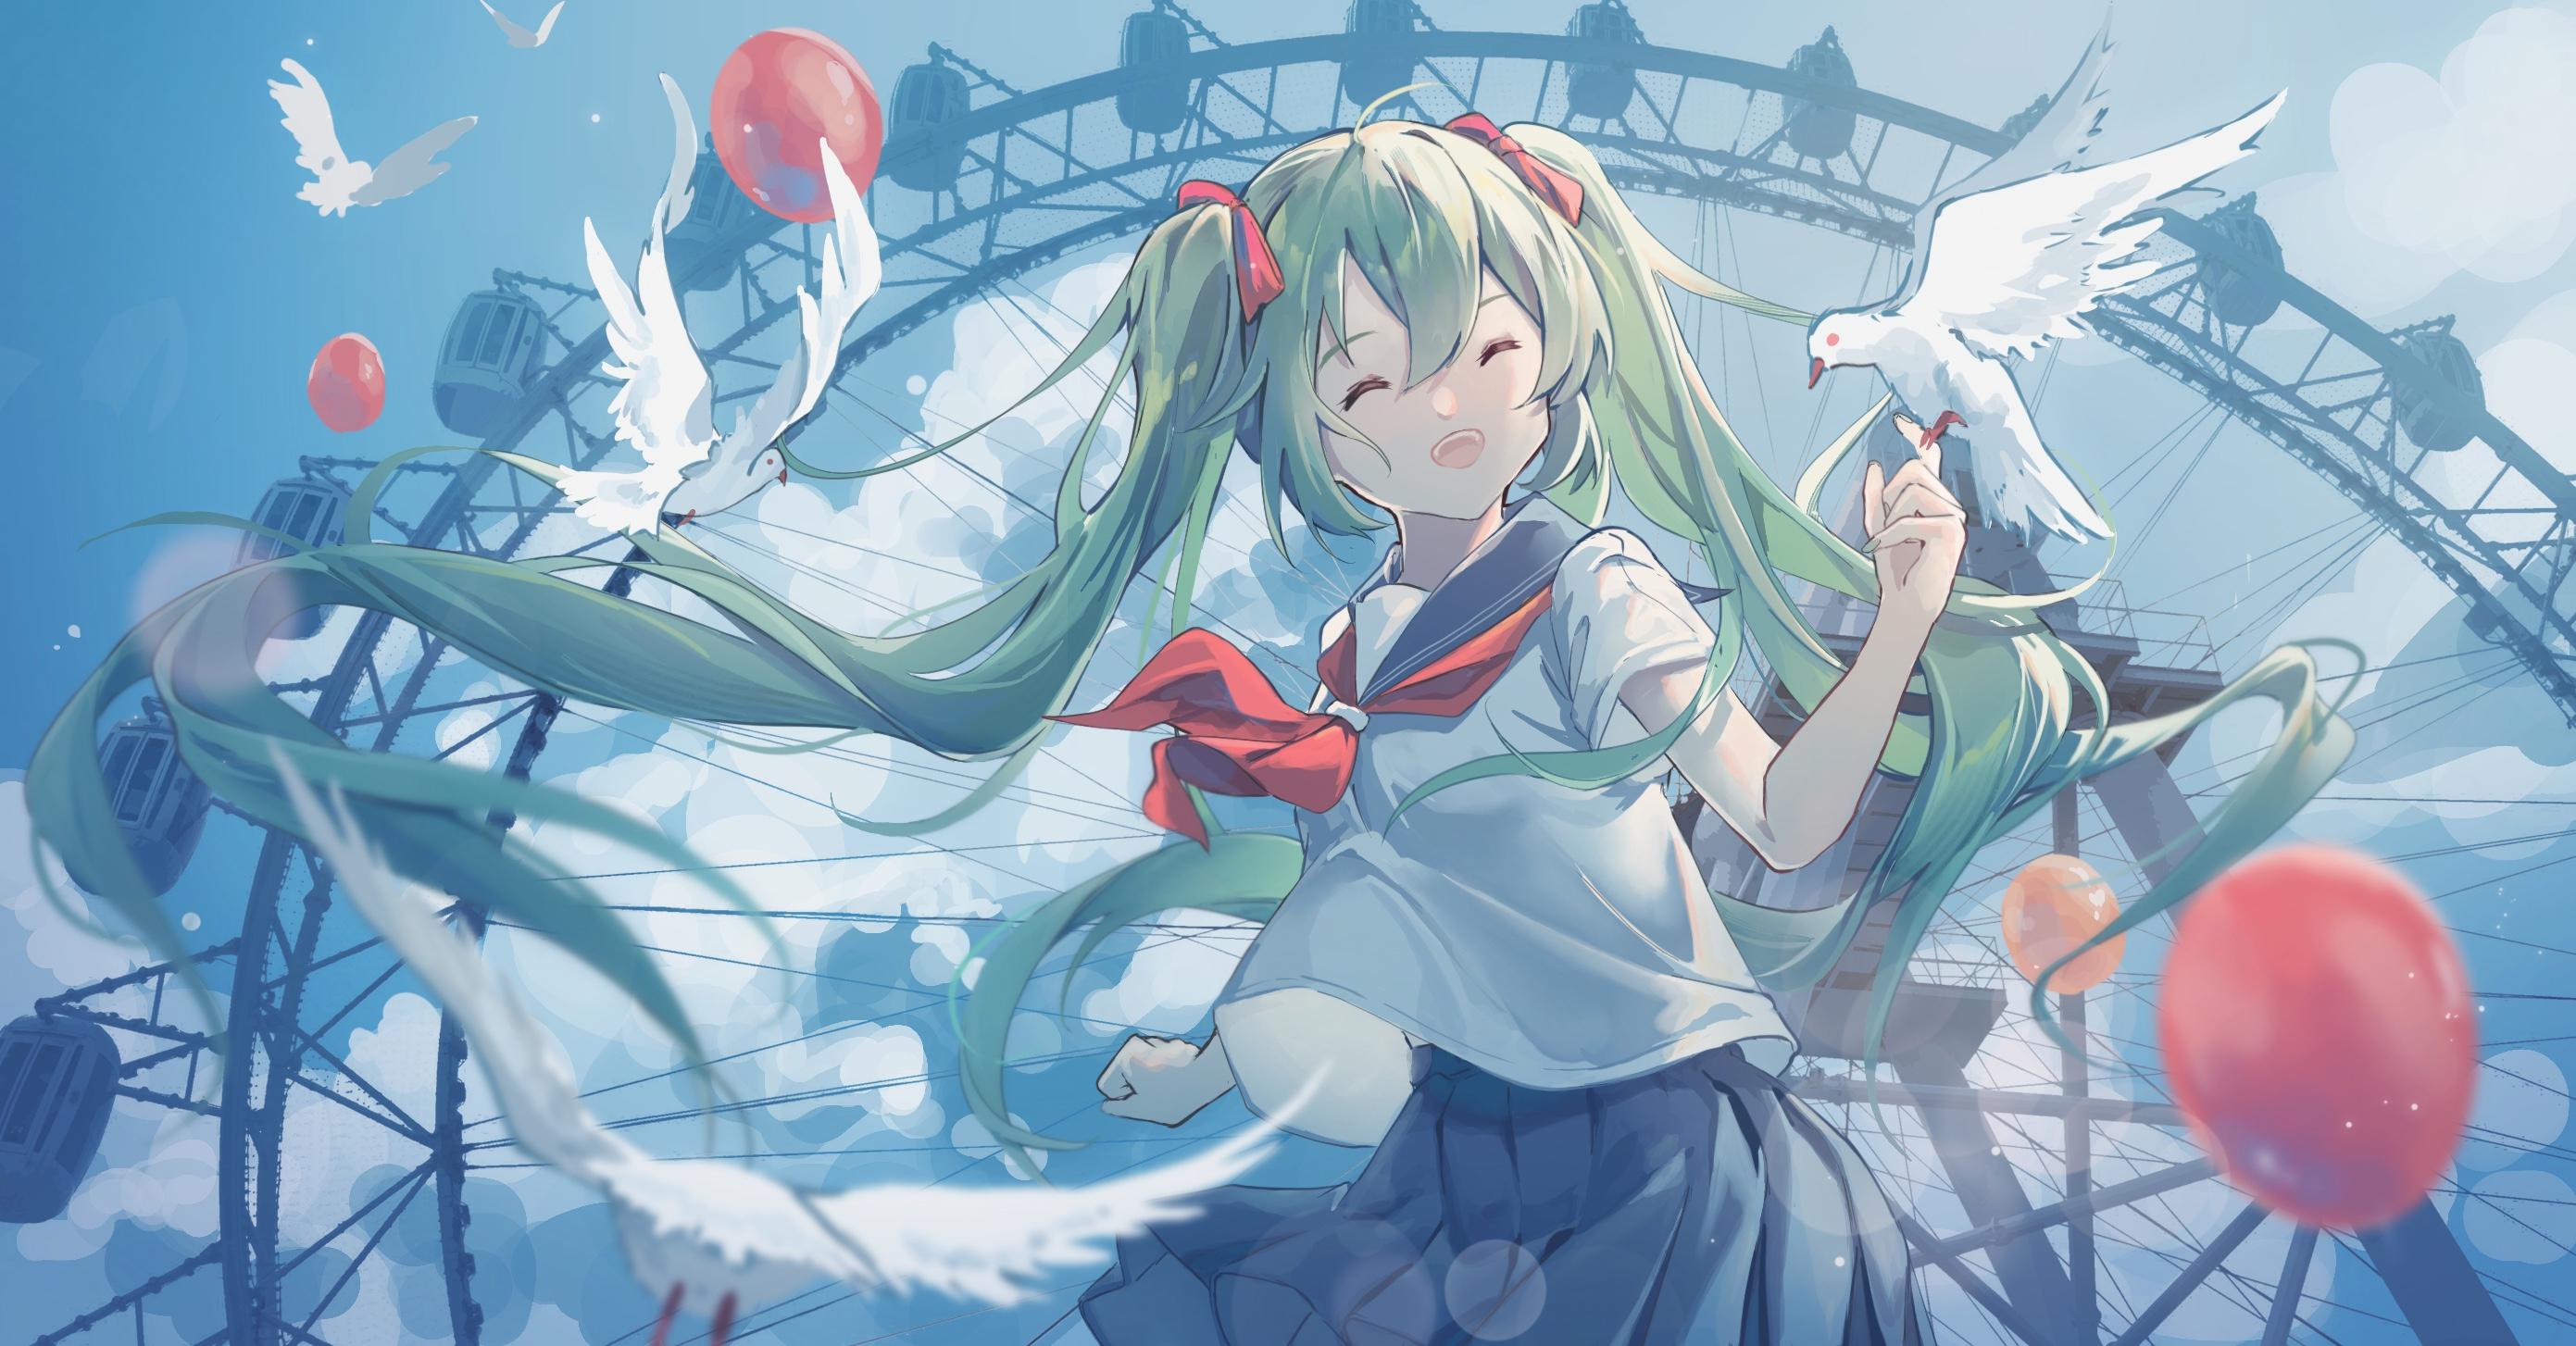 Anime Anime Girls Vocaloid Hatsune Miku School Uniform Twintails 2782x1454